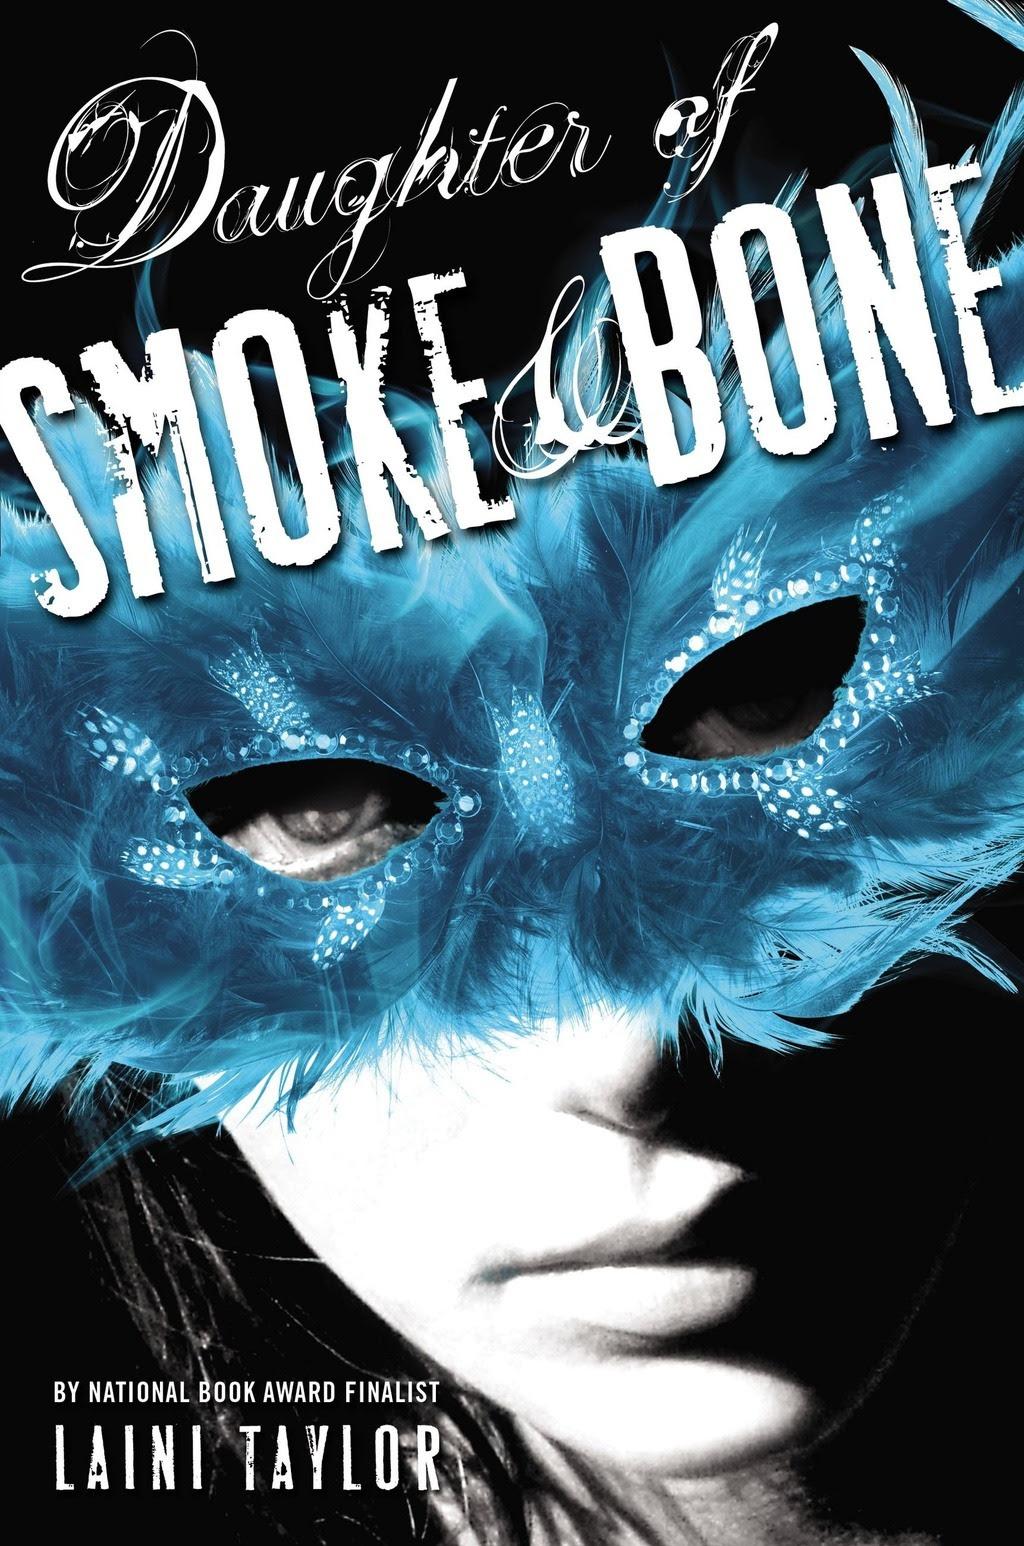 http://booksinthestarrynight.blogspot.it/2015/09/recensione-daughter-of-smoke-bone-la.html